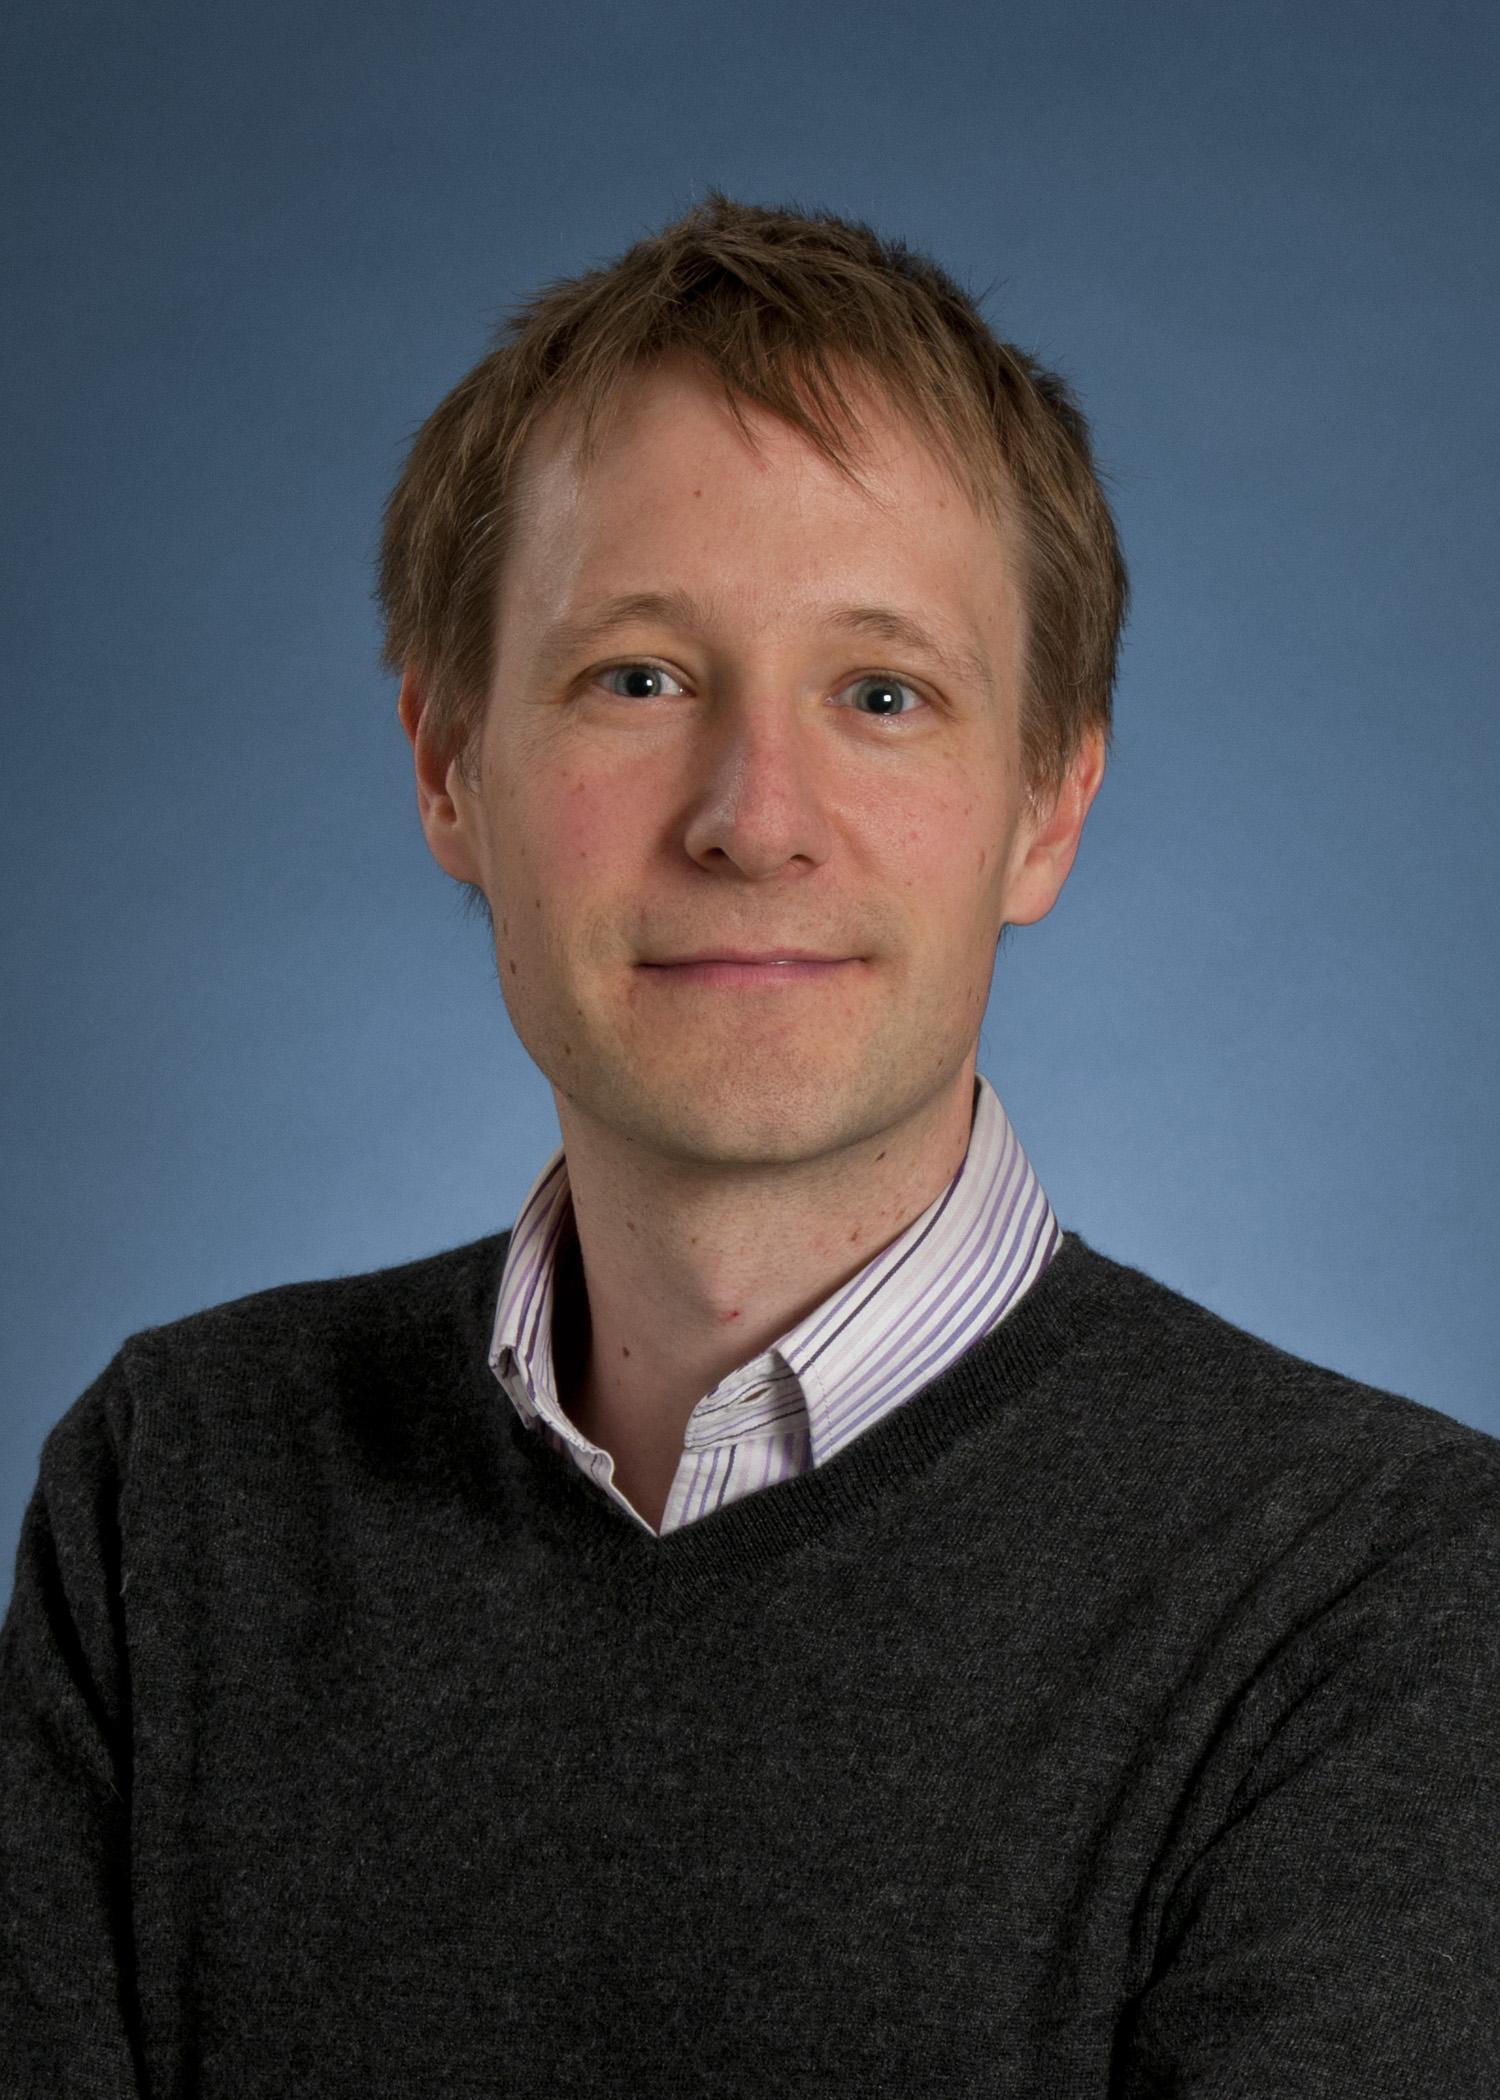 Michael Voth